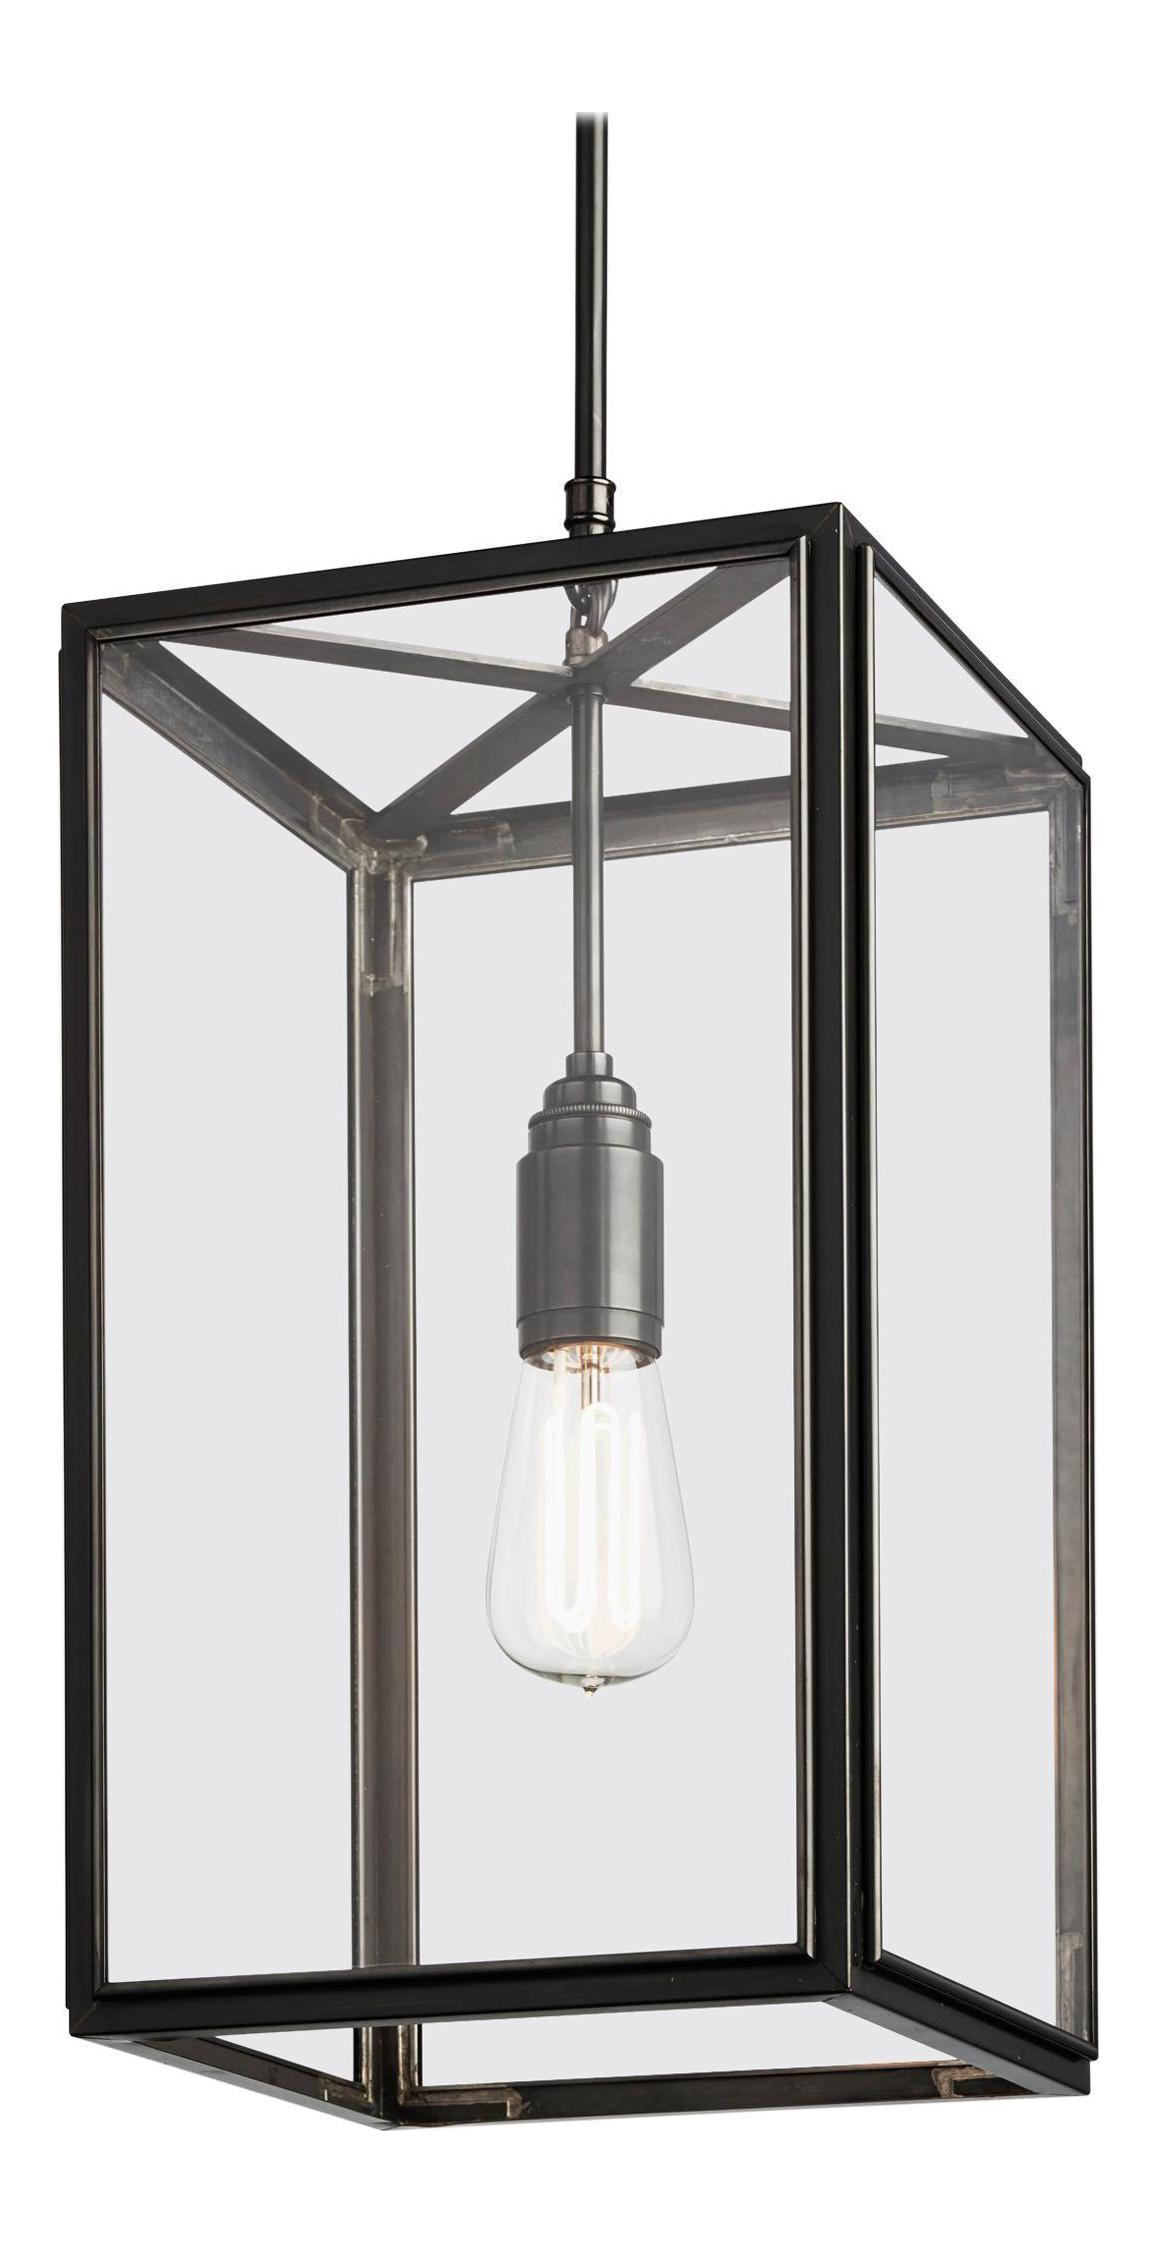 Tekna Ilford C Pendant Light With Dark Bronze Finish And Clear Glass Chairish